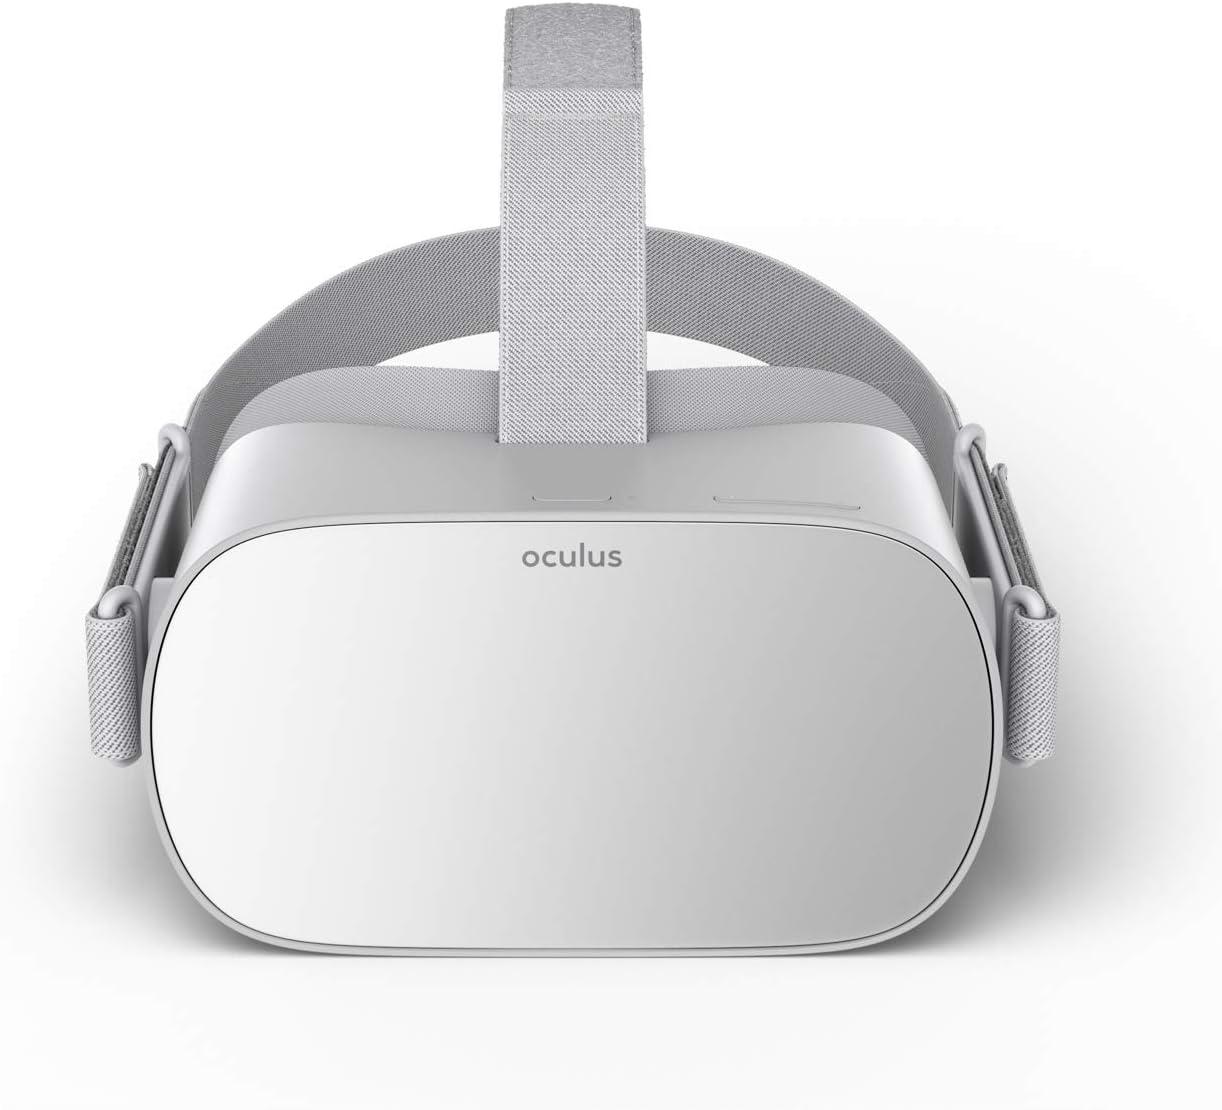 Amazon com: Oculus Go Standalone Virtual Reality Headset